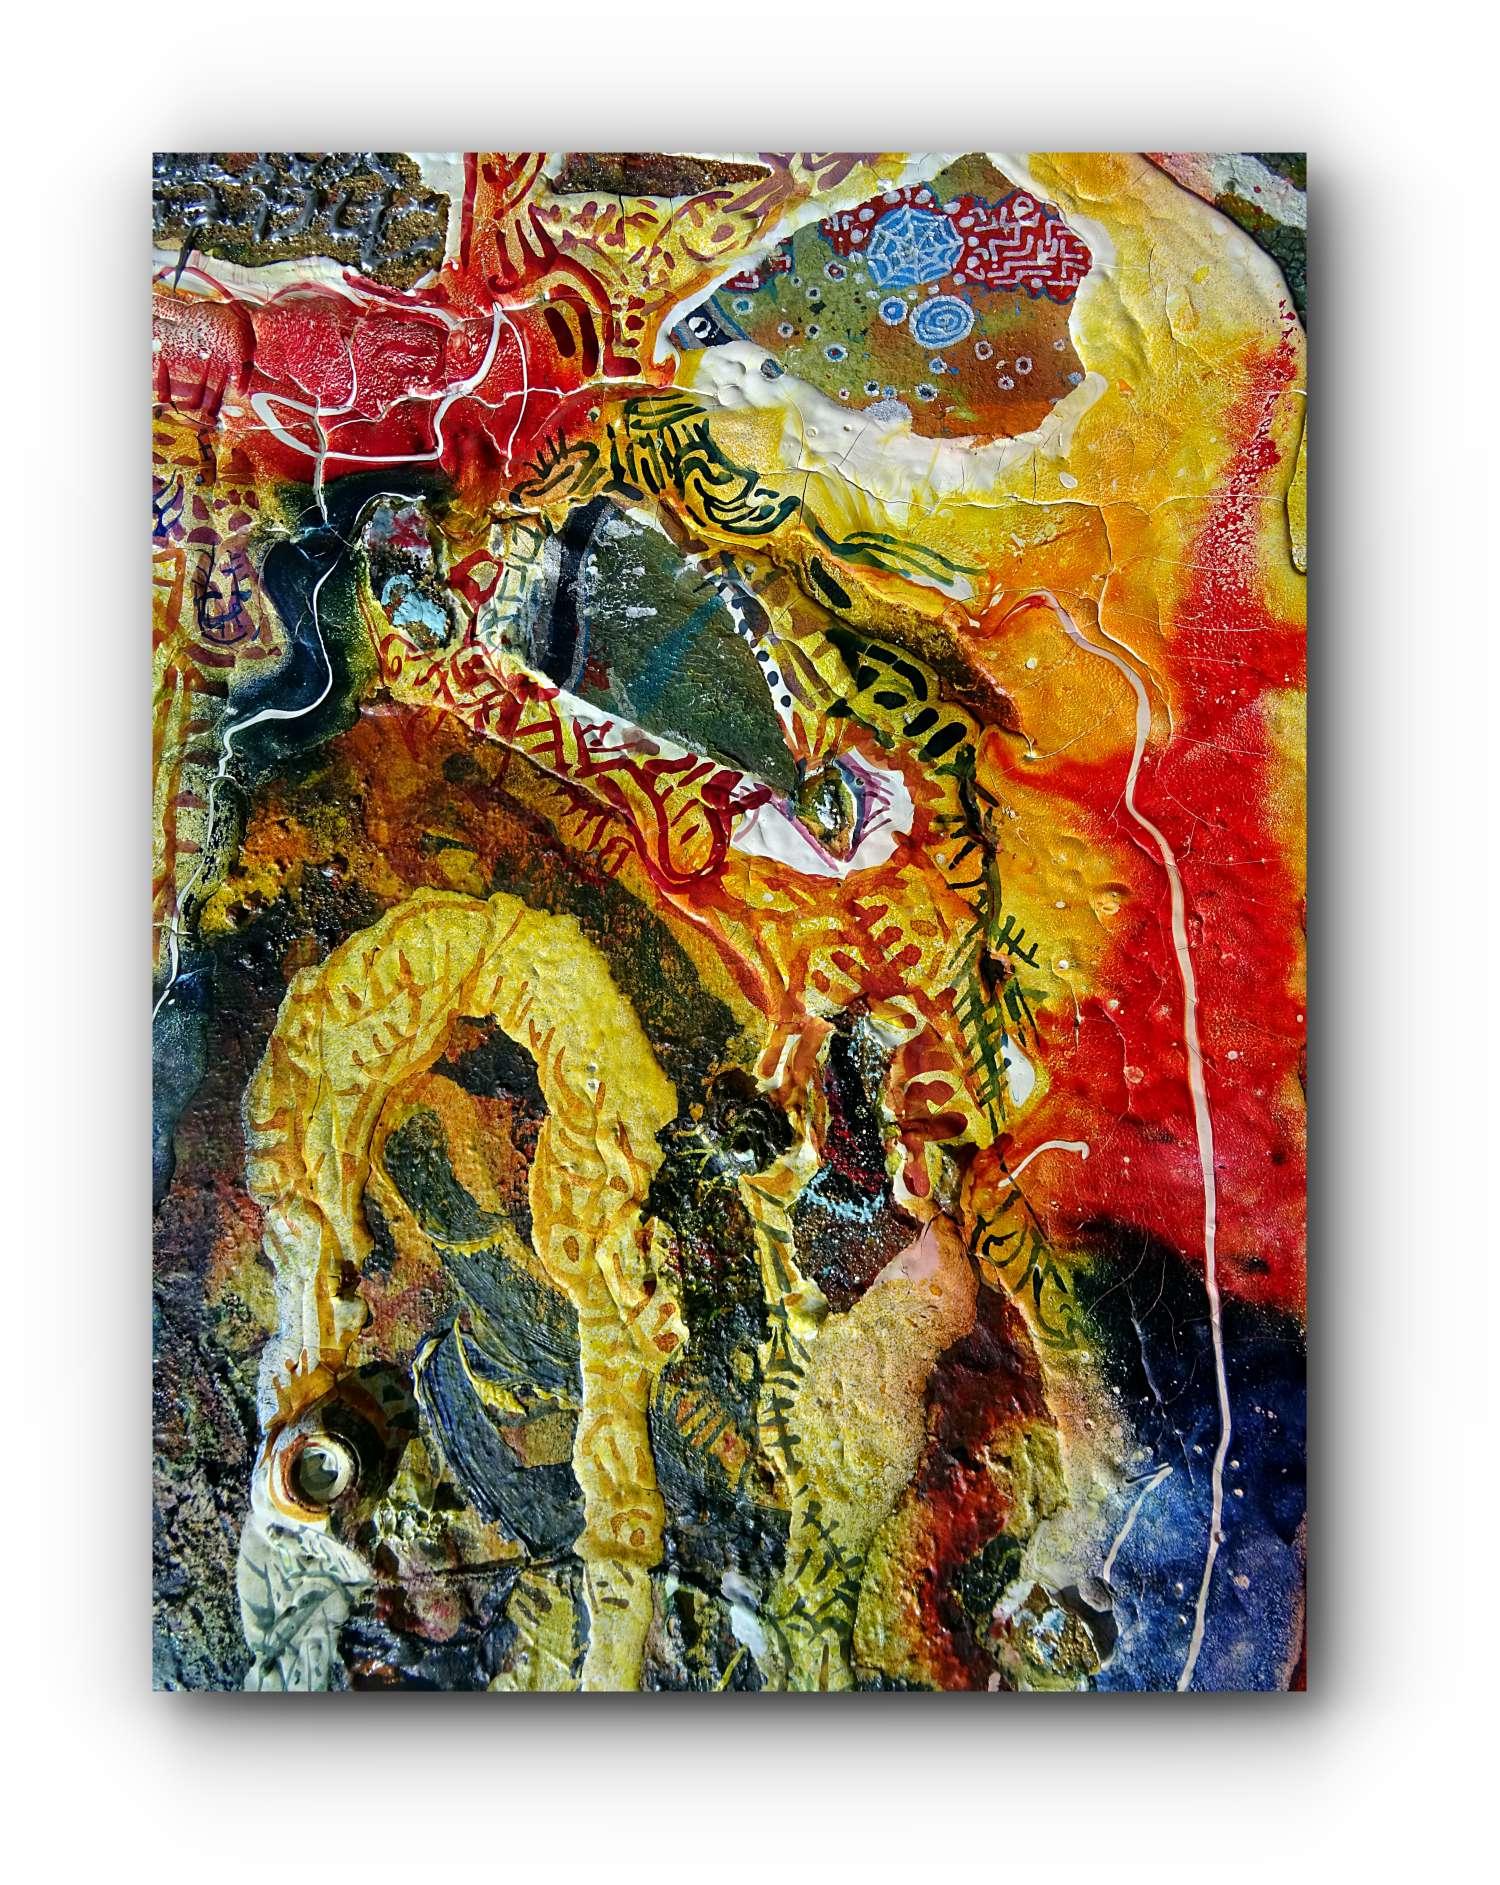 painting-detail-7-kiss-artist-duo-ingress-vortices.jpg